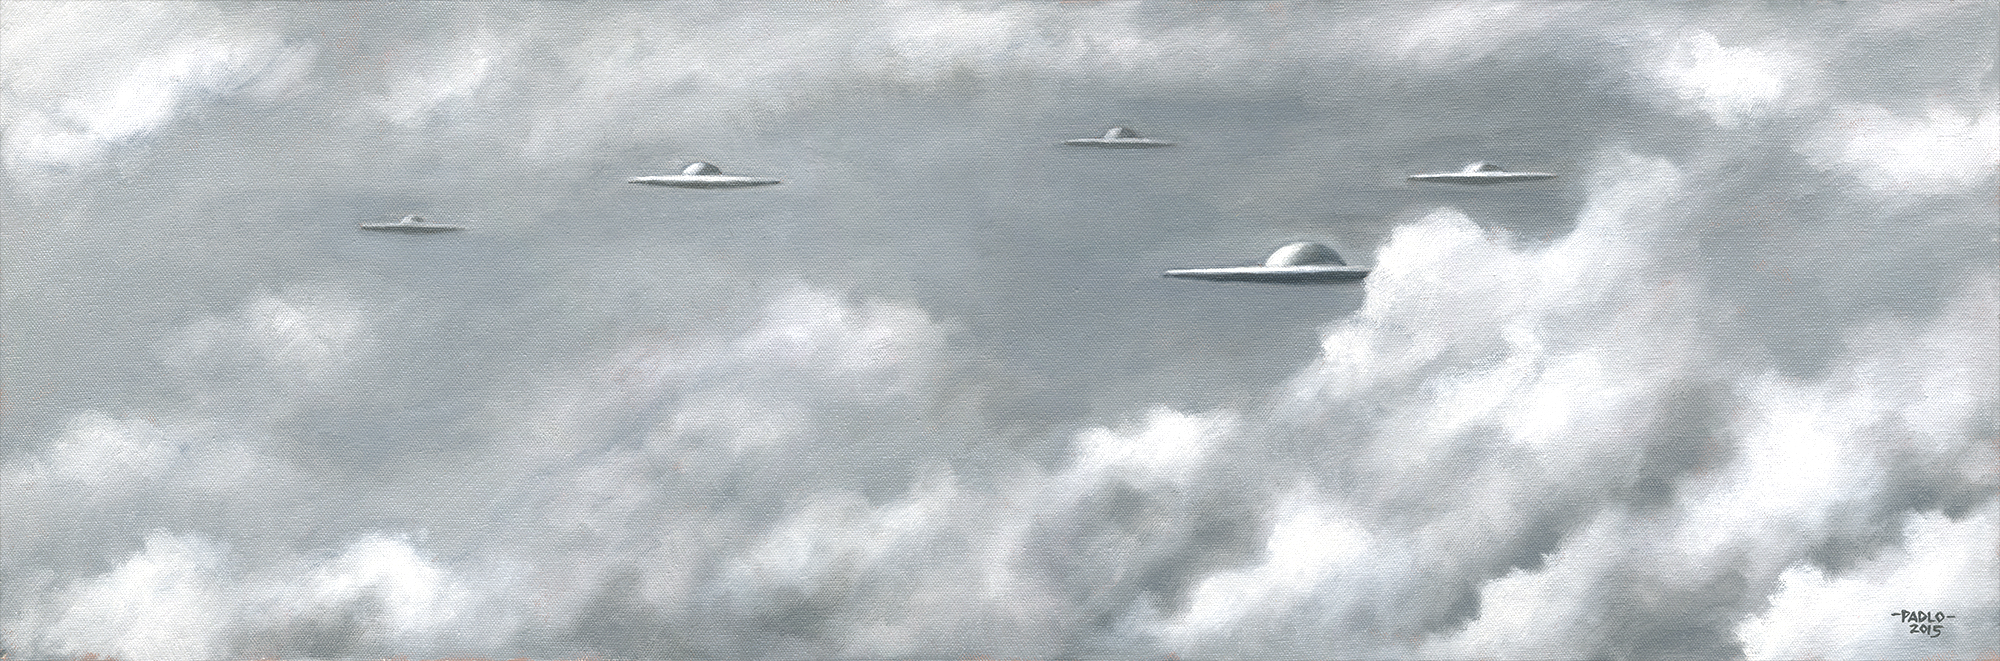 UFO SIGHTING 25